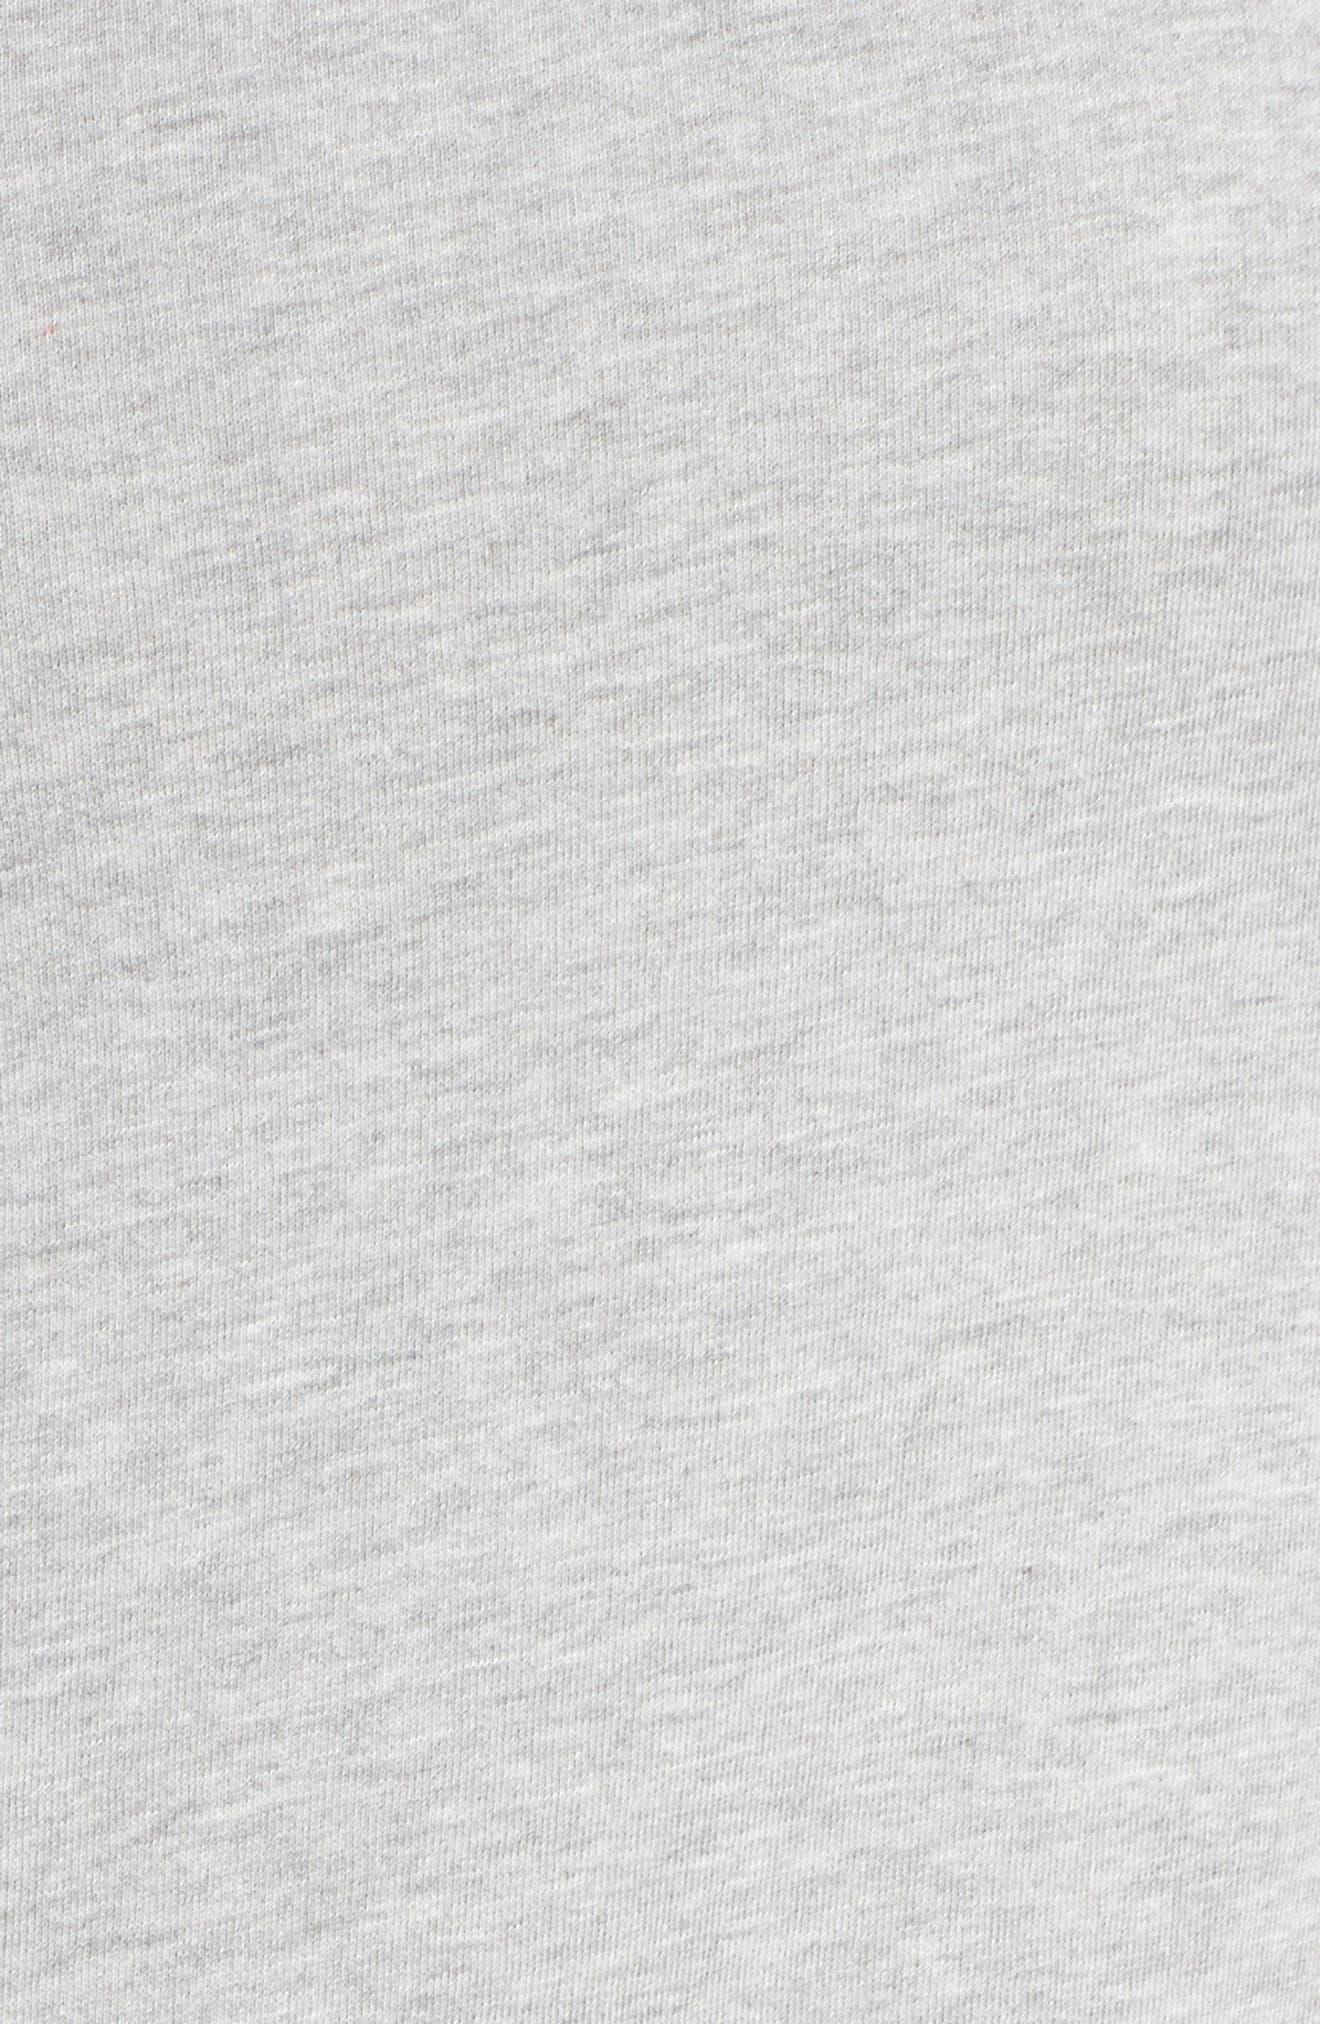 Woven Hem Sweatshirt,                             Alternate thumbnail 5, color,                             030